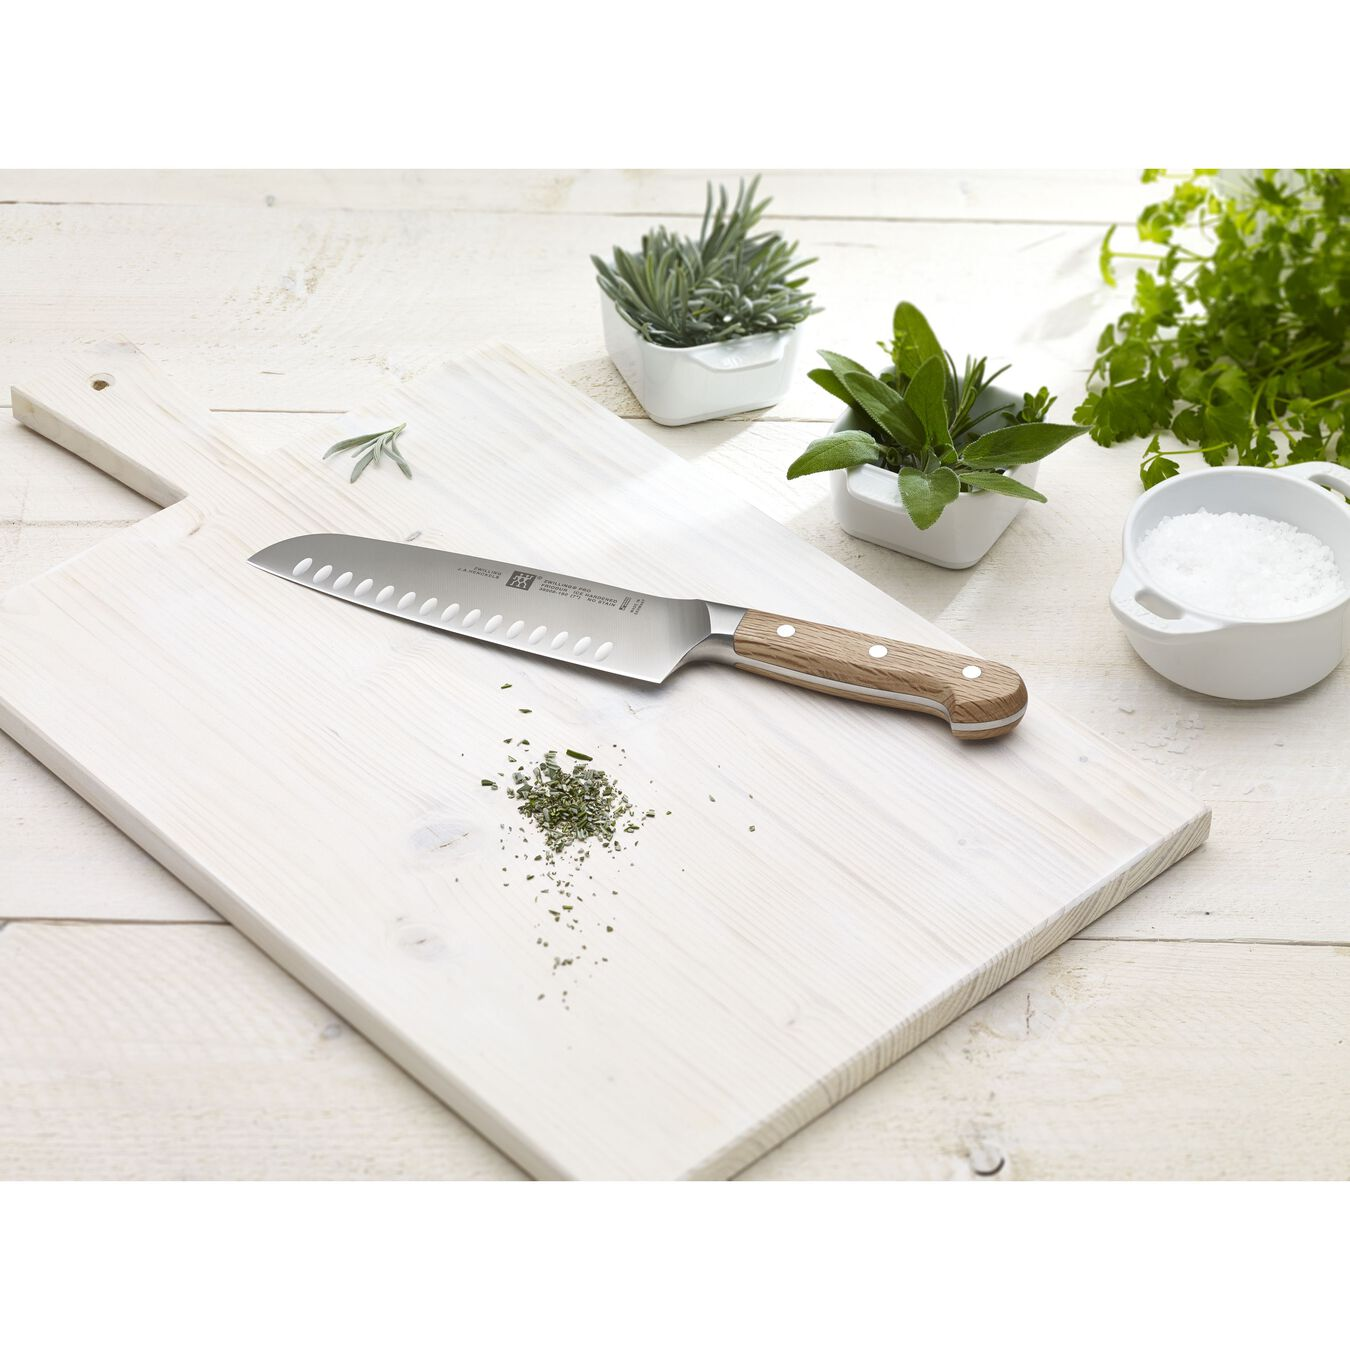 Couteau santoku 18 cm, Nature, Chêne vert,,large 2